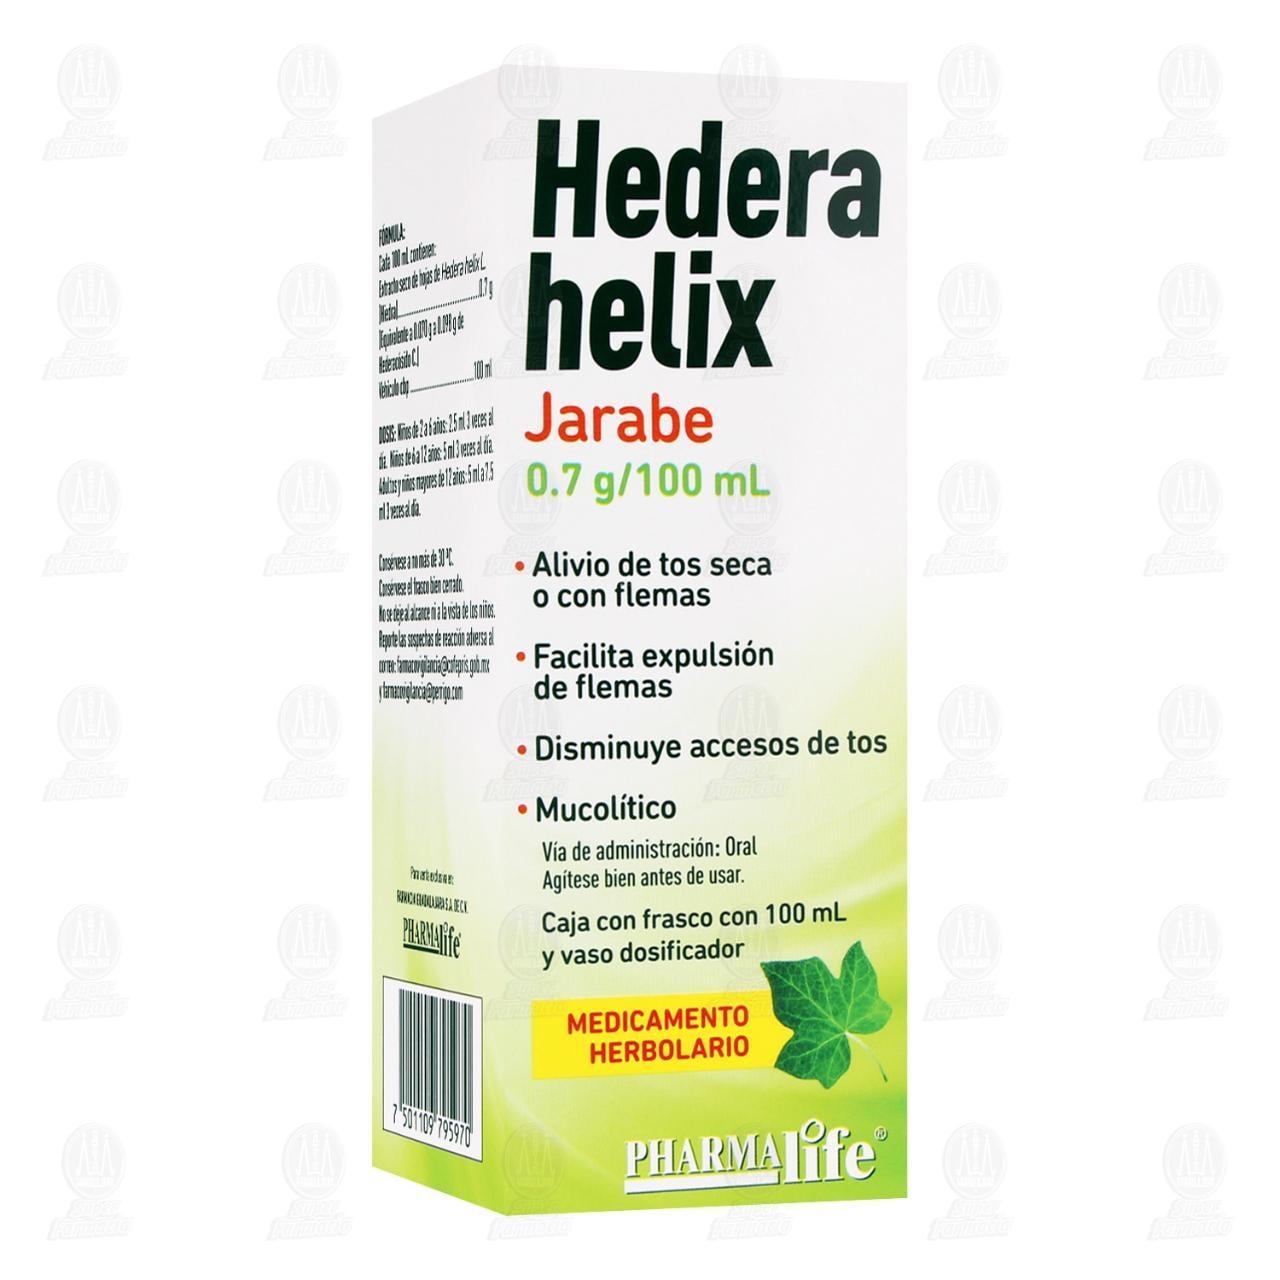 Comprar Hedera Helix Jarabe 0.7gr/100ml Pharmalife en Farmacias Guadalajara